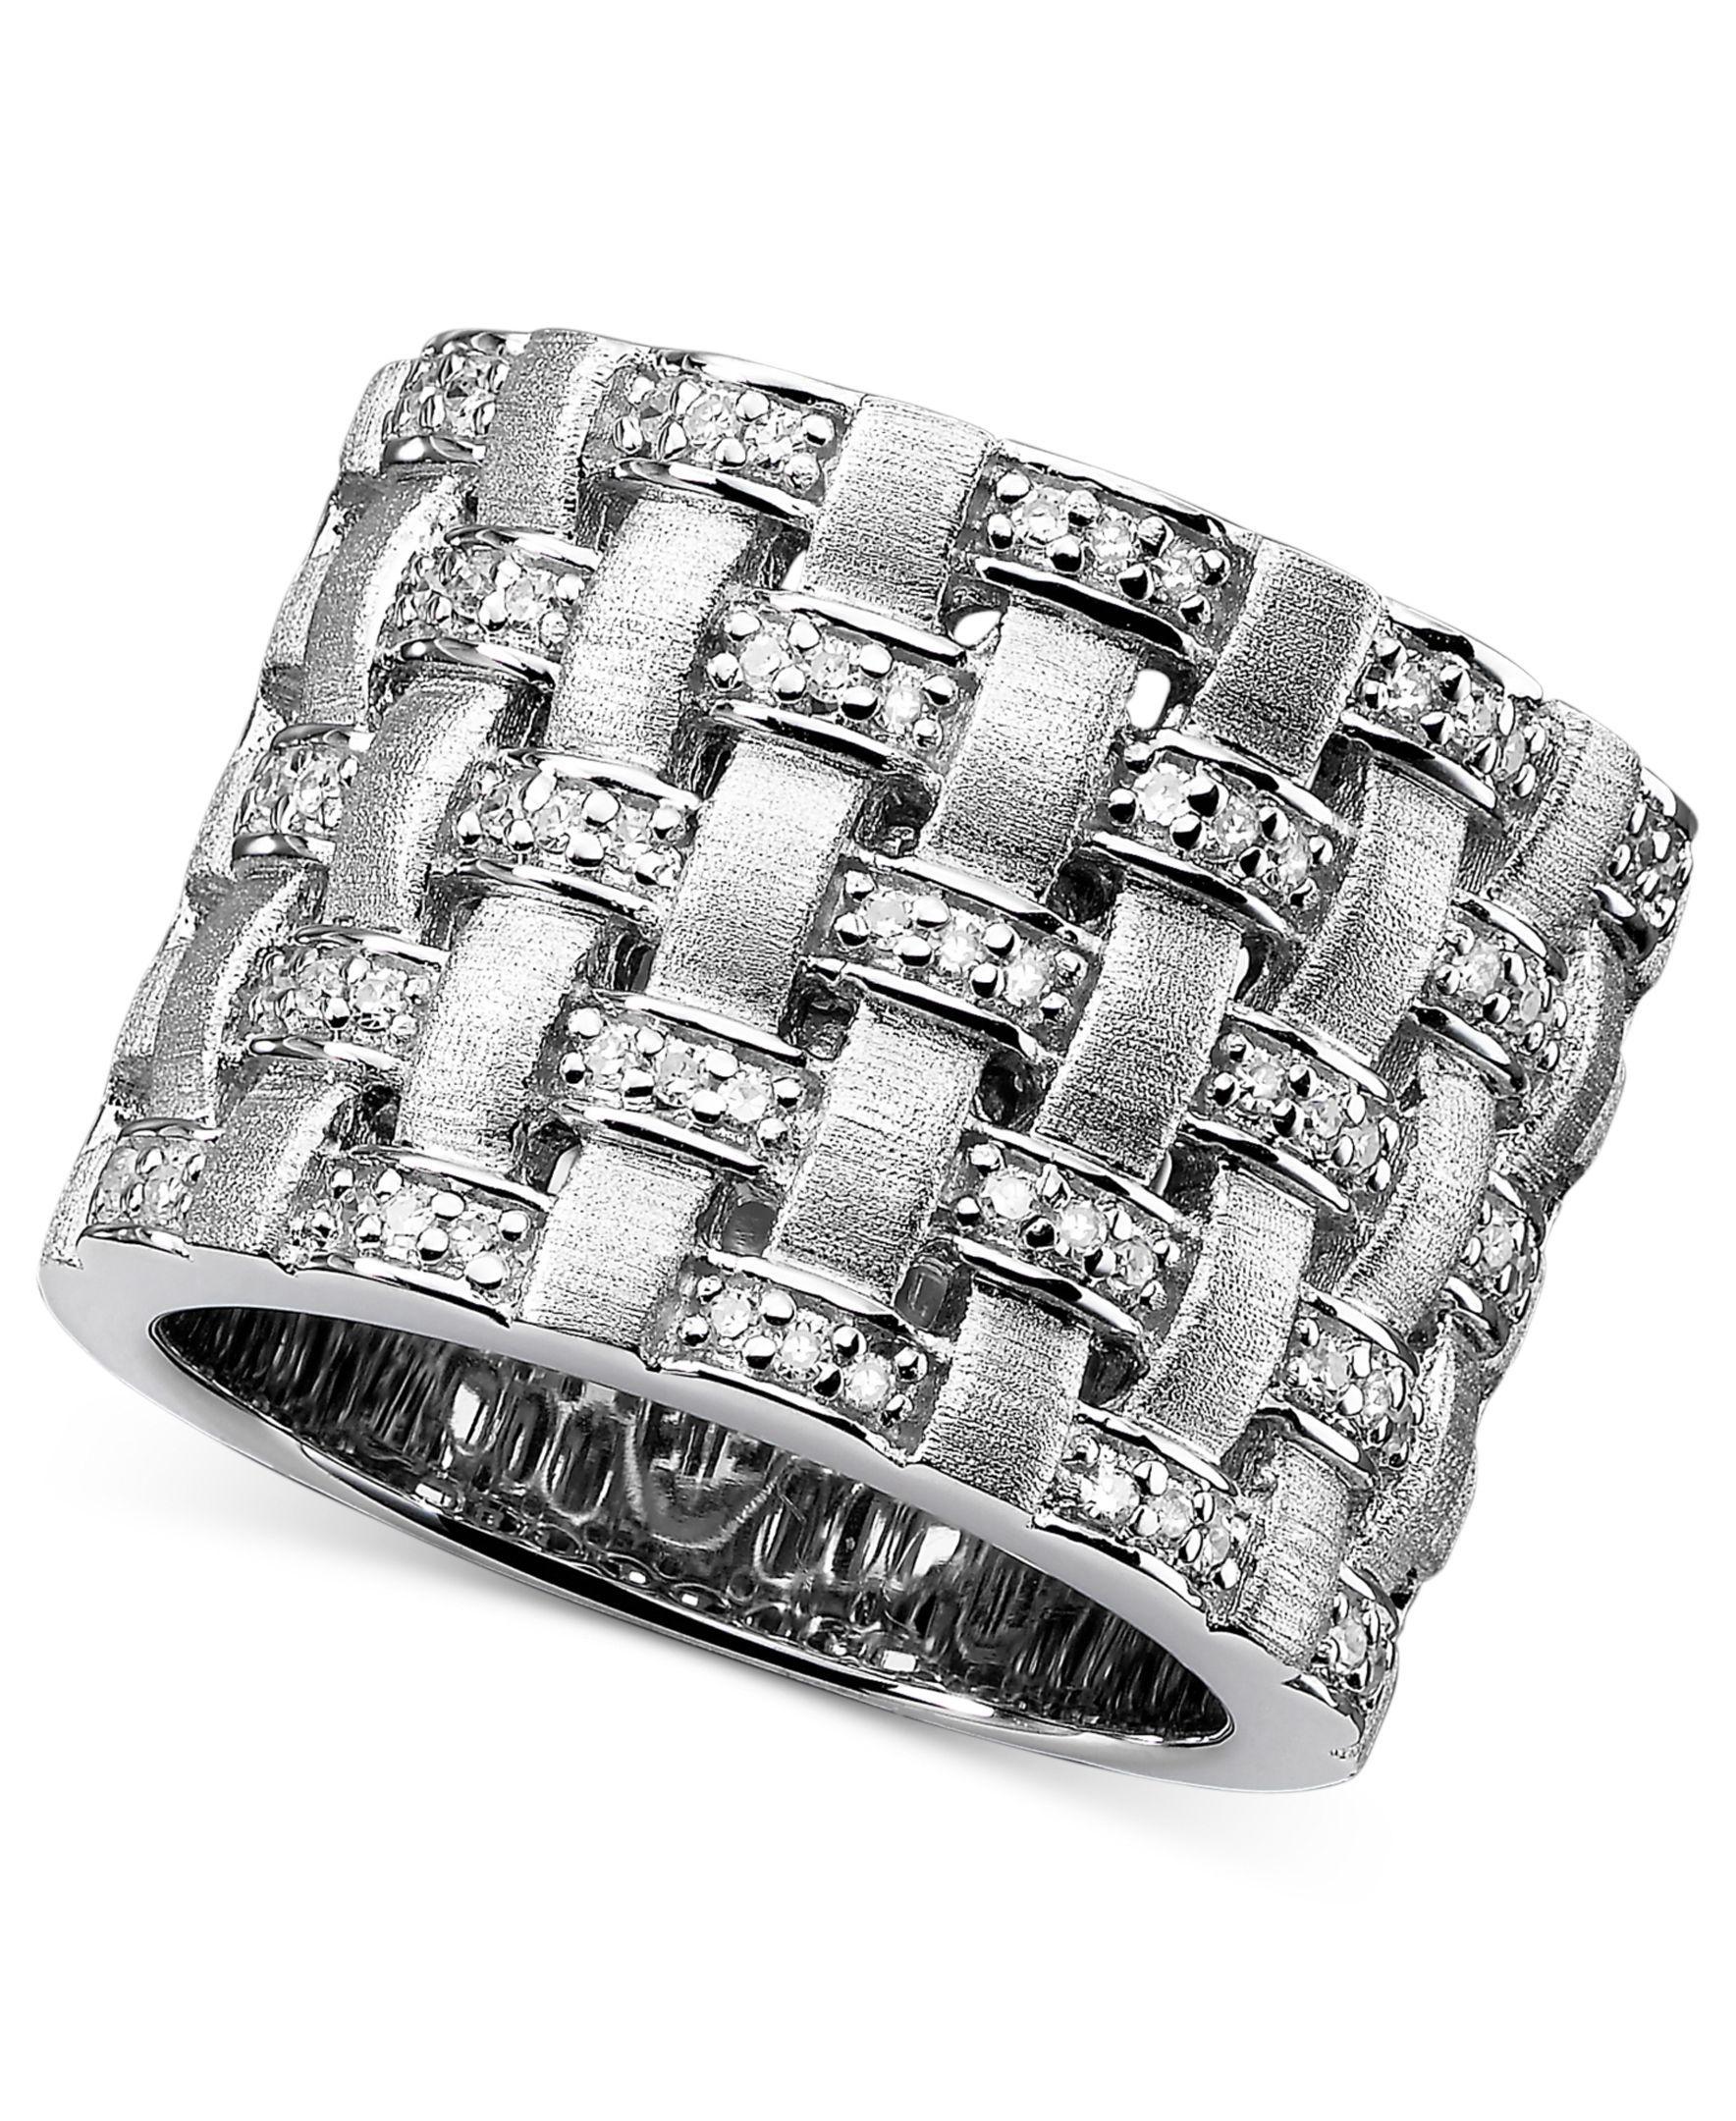 Balissima by Effy Diamond Basket Weave (1/4 ct. t.w.) in Sterling Silver